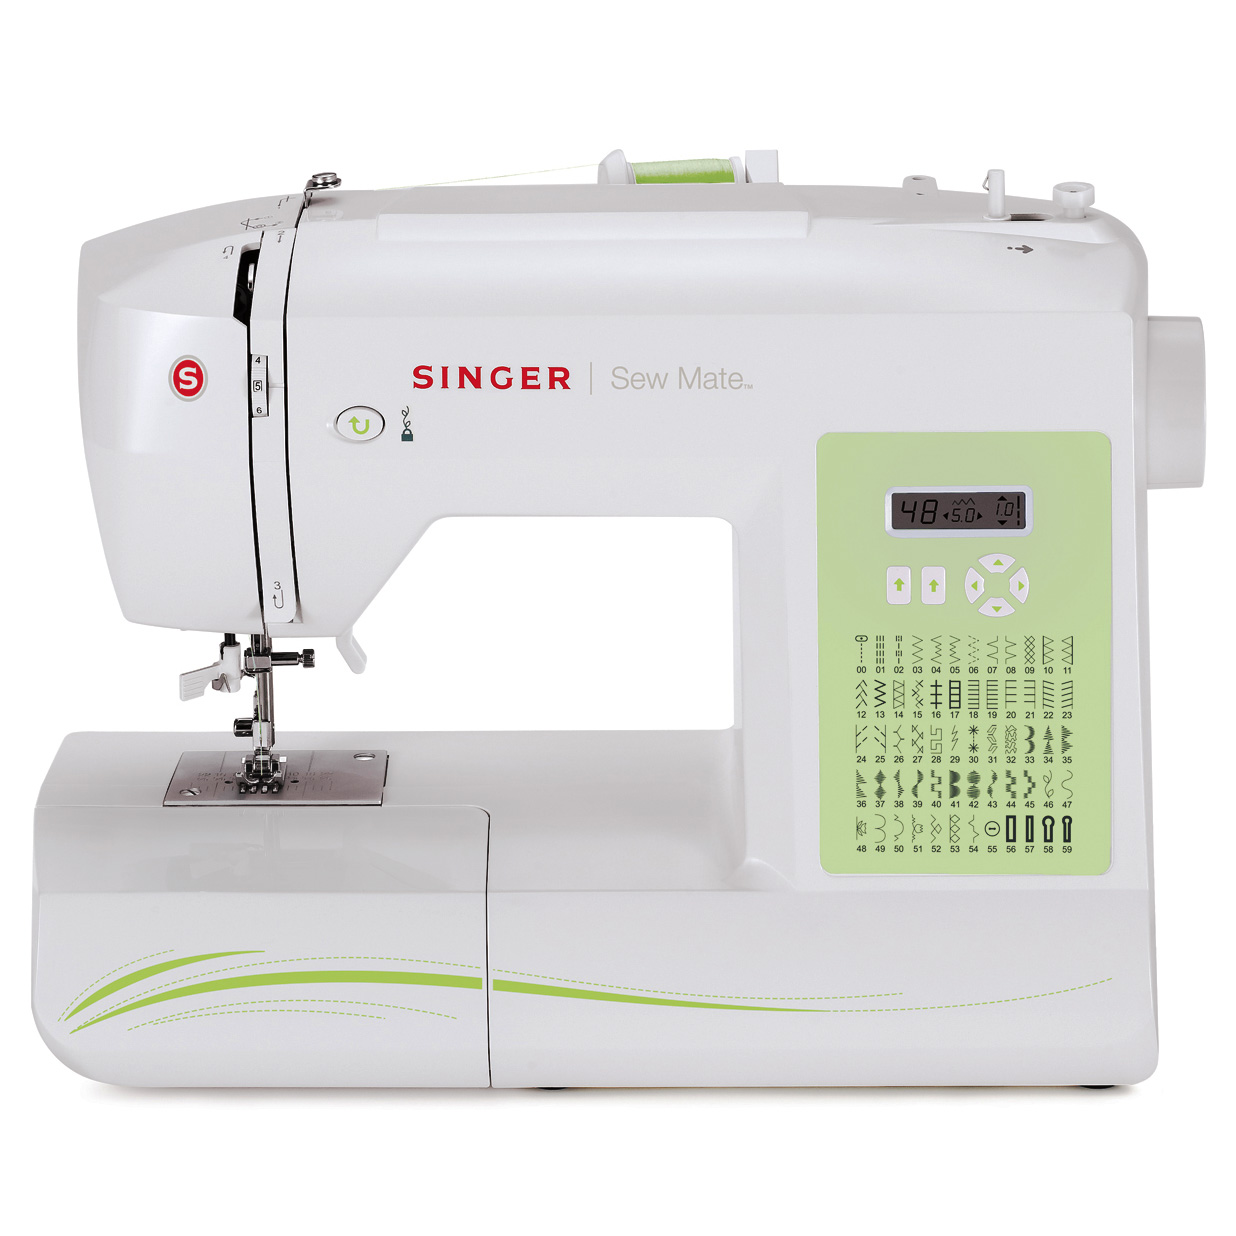 Singer Sew Mate Sewing Machine (5400)